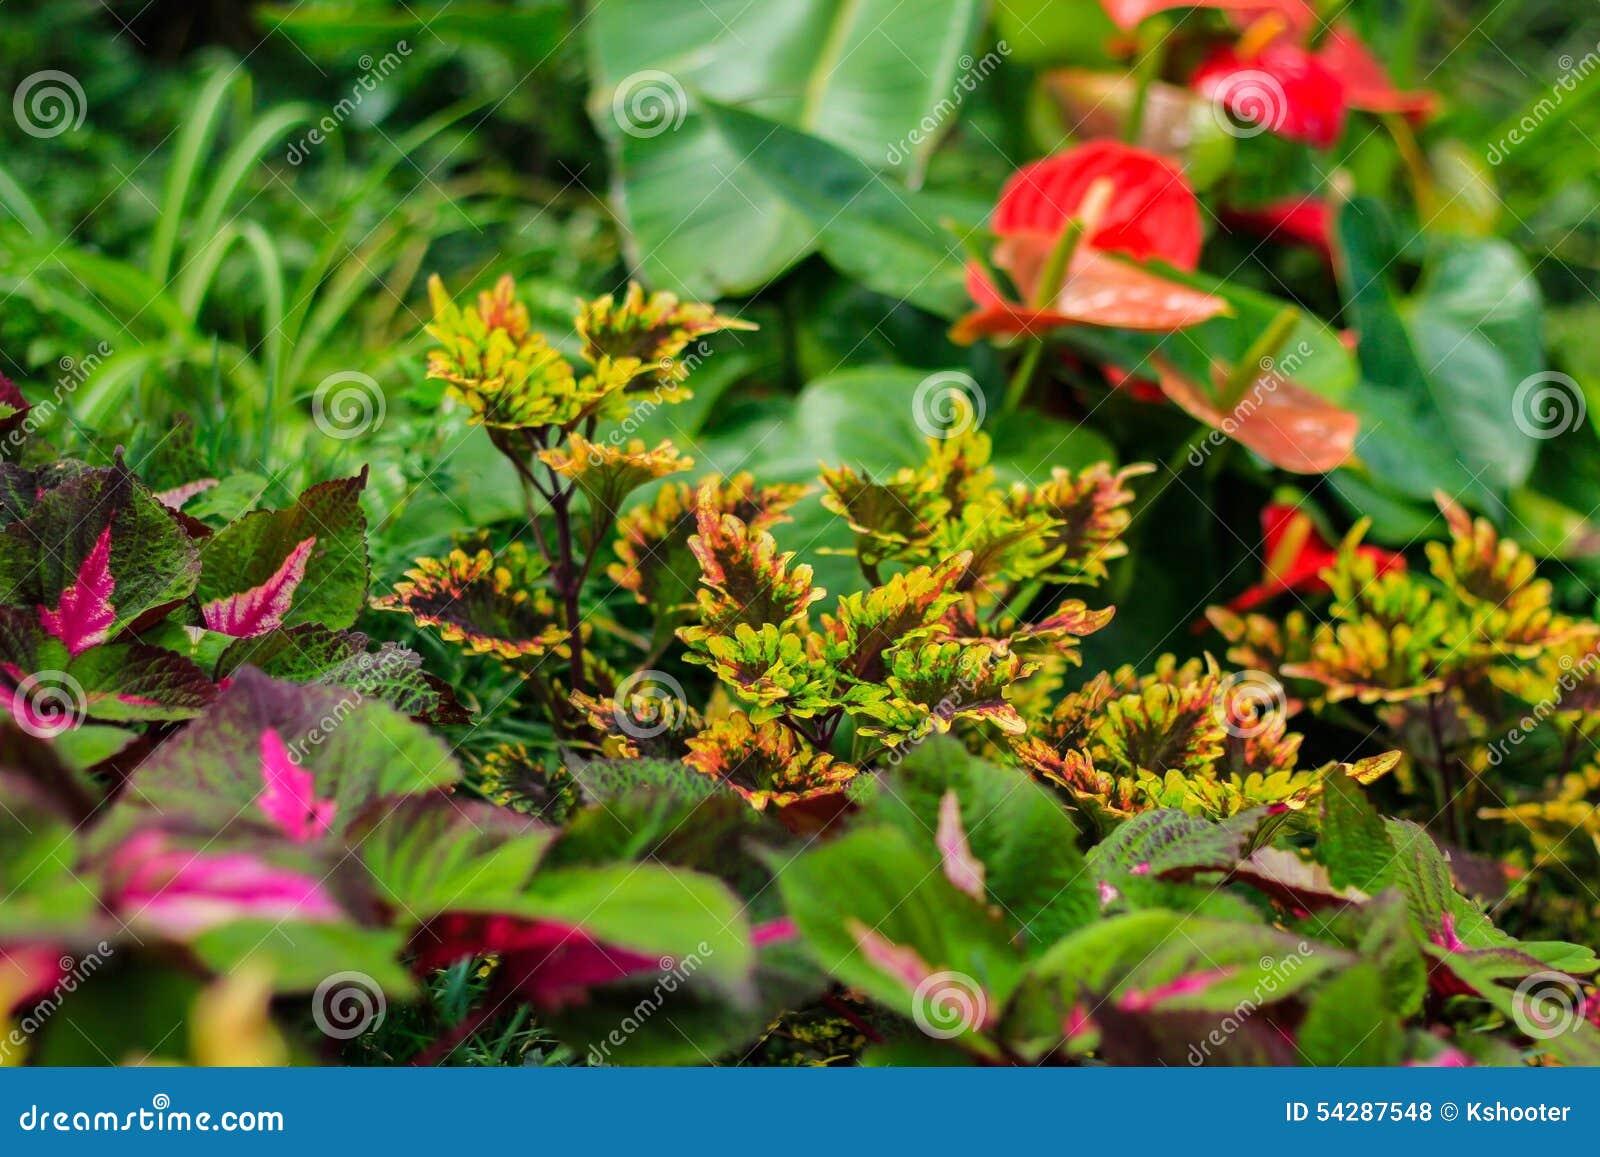 Rainforest Plants Stock Photo - Image: 54287548